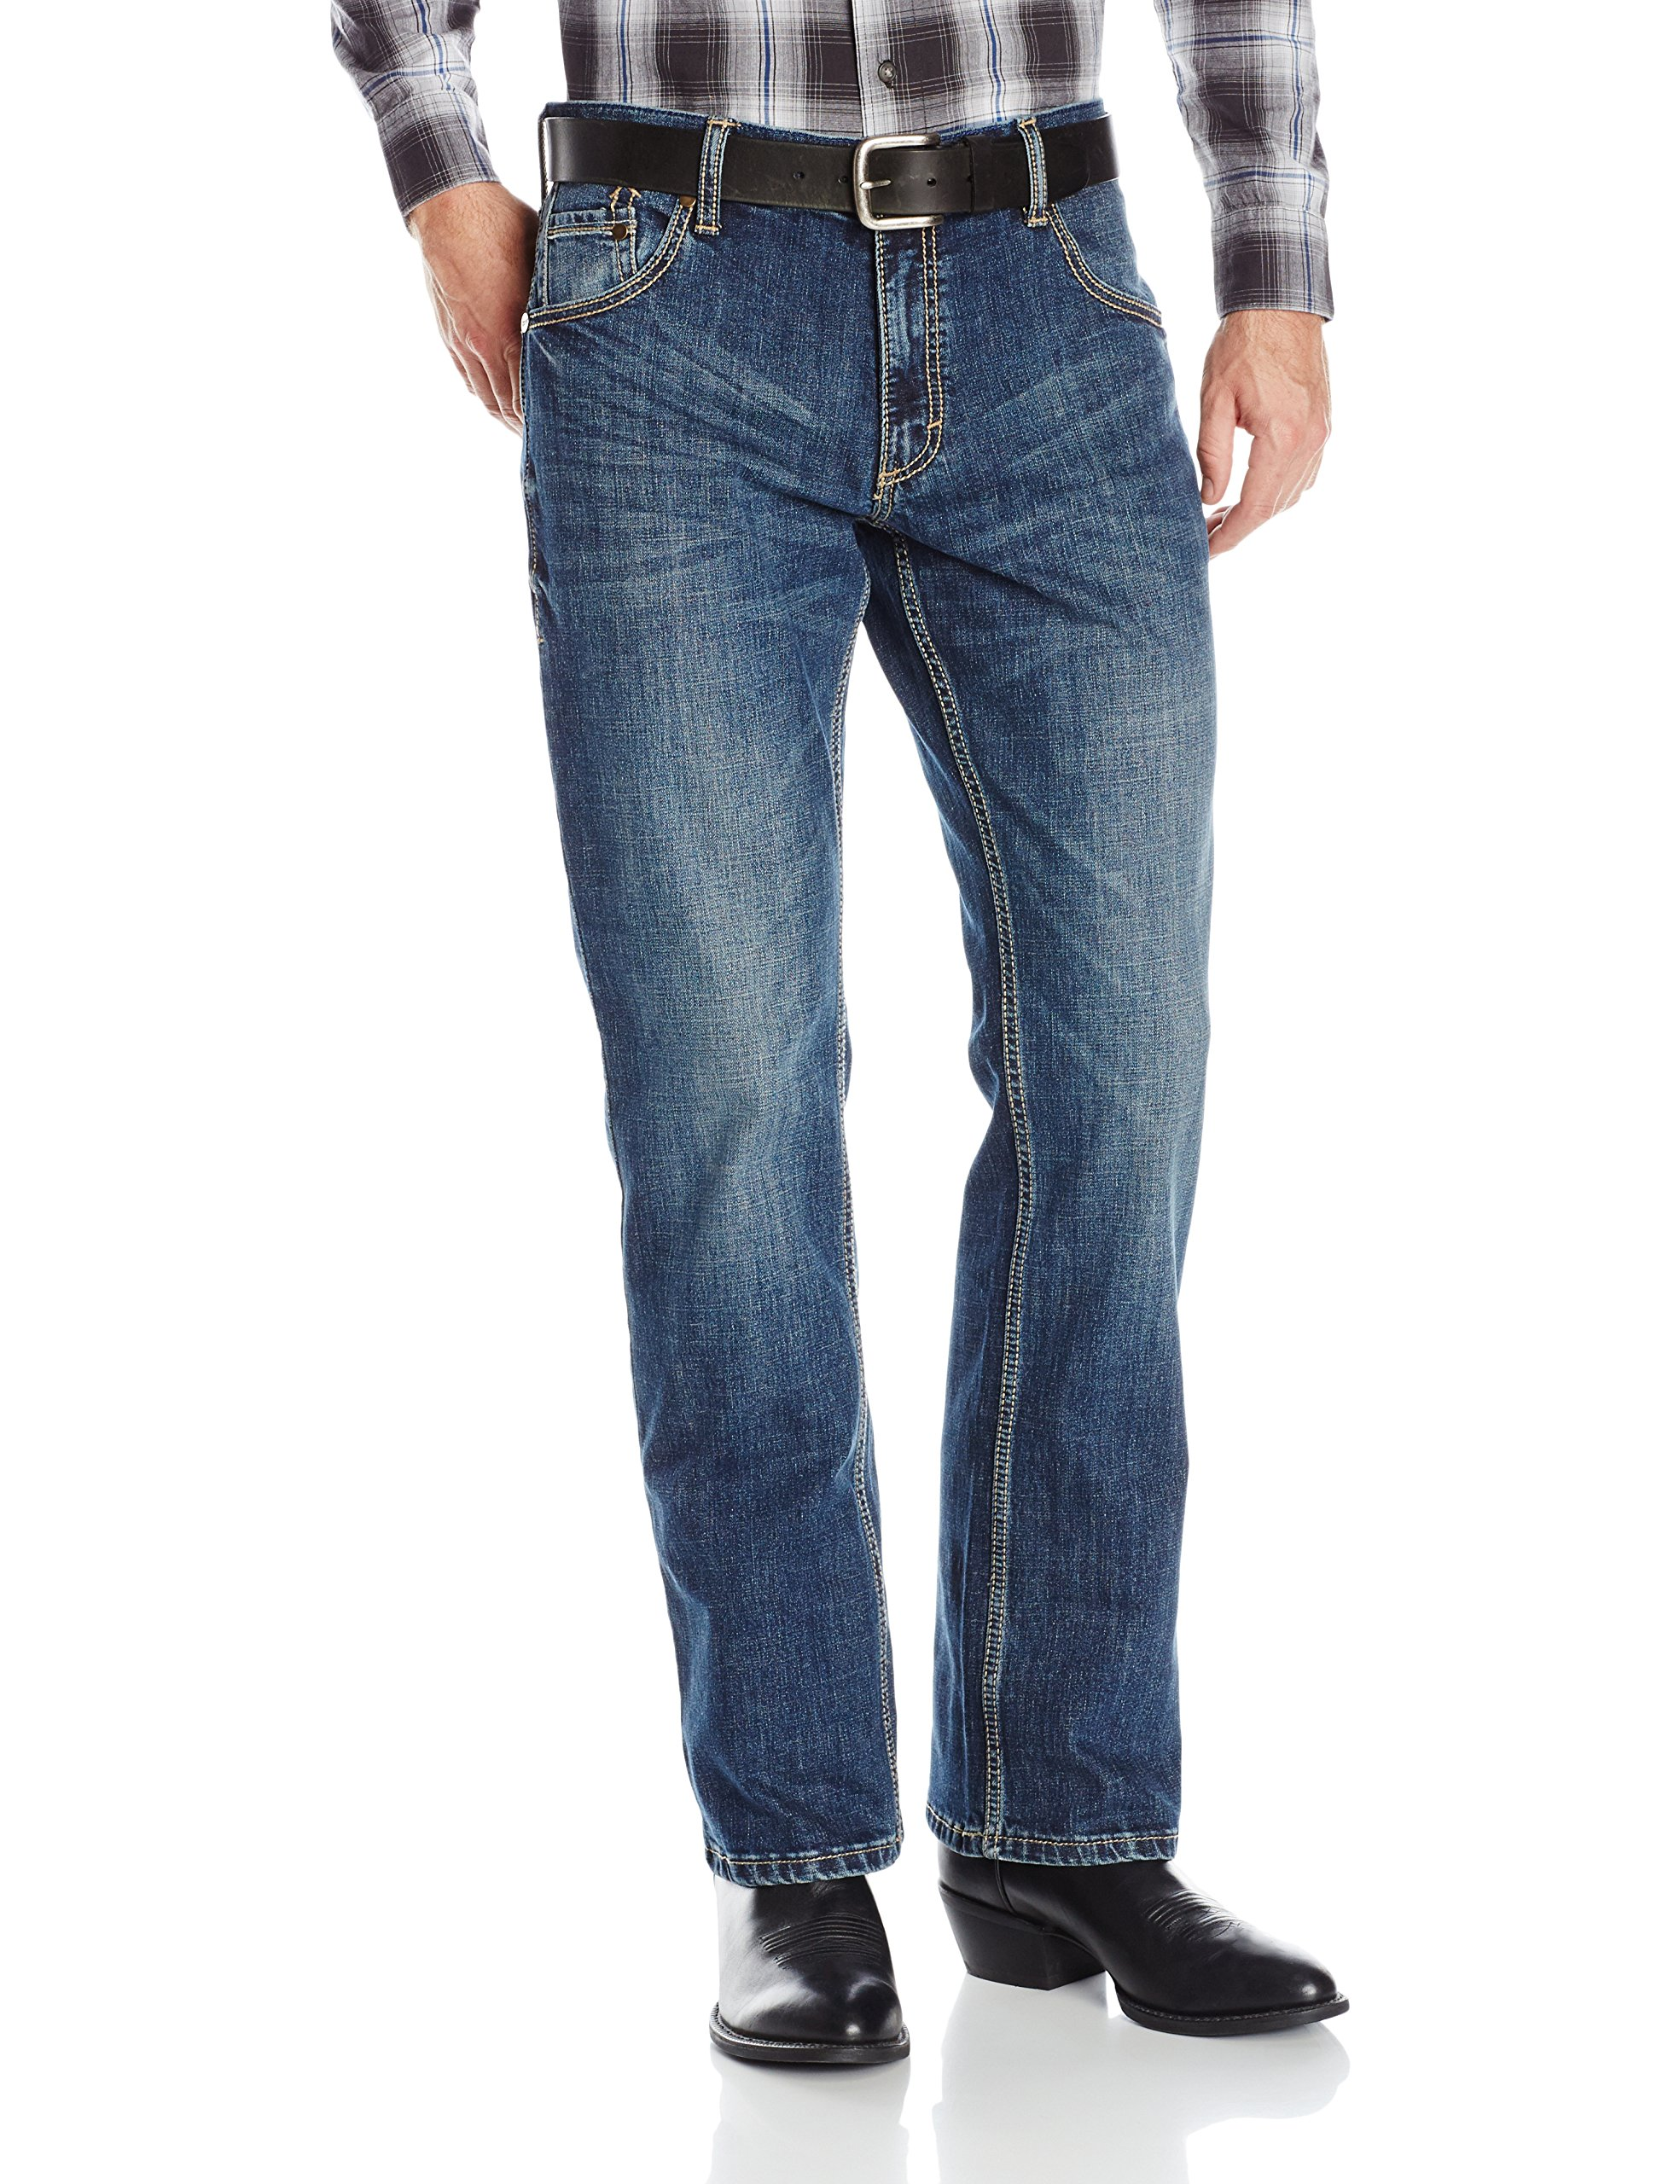 Wrangler Men's Retro Slim Fit Boot Cut Jean, Layton, 40x32